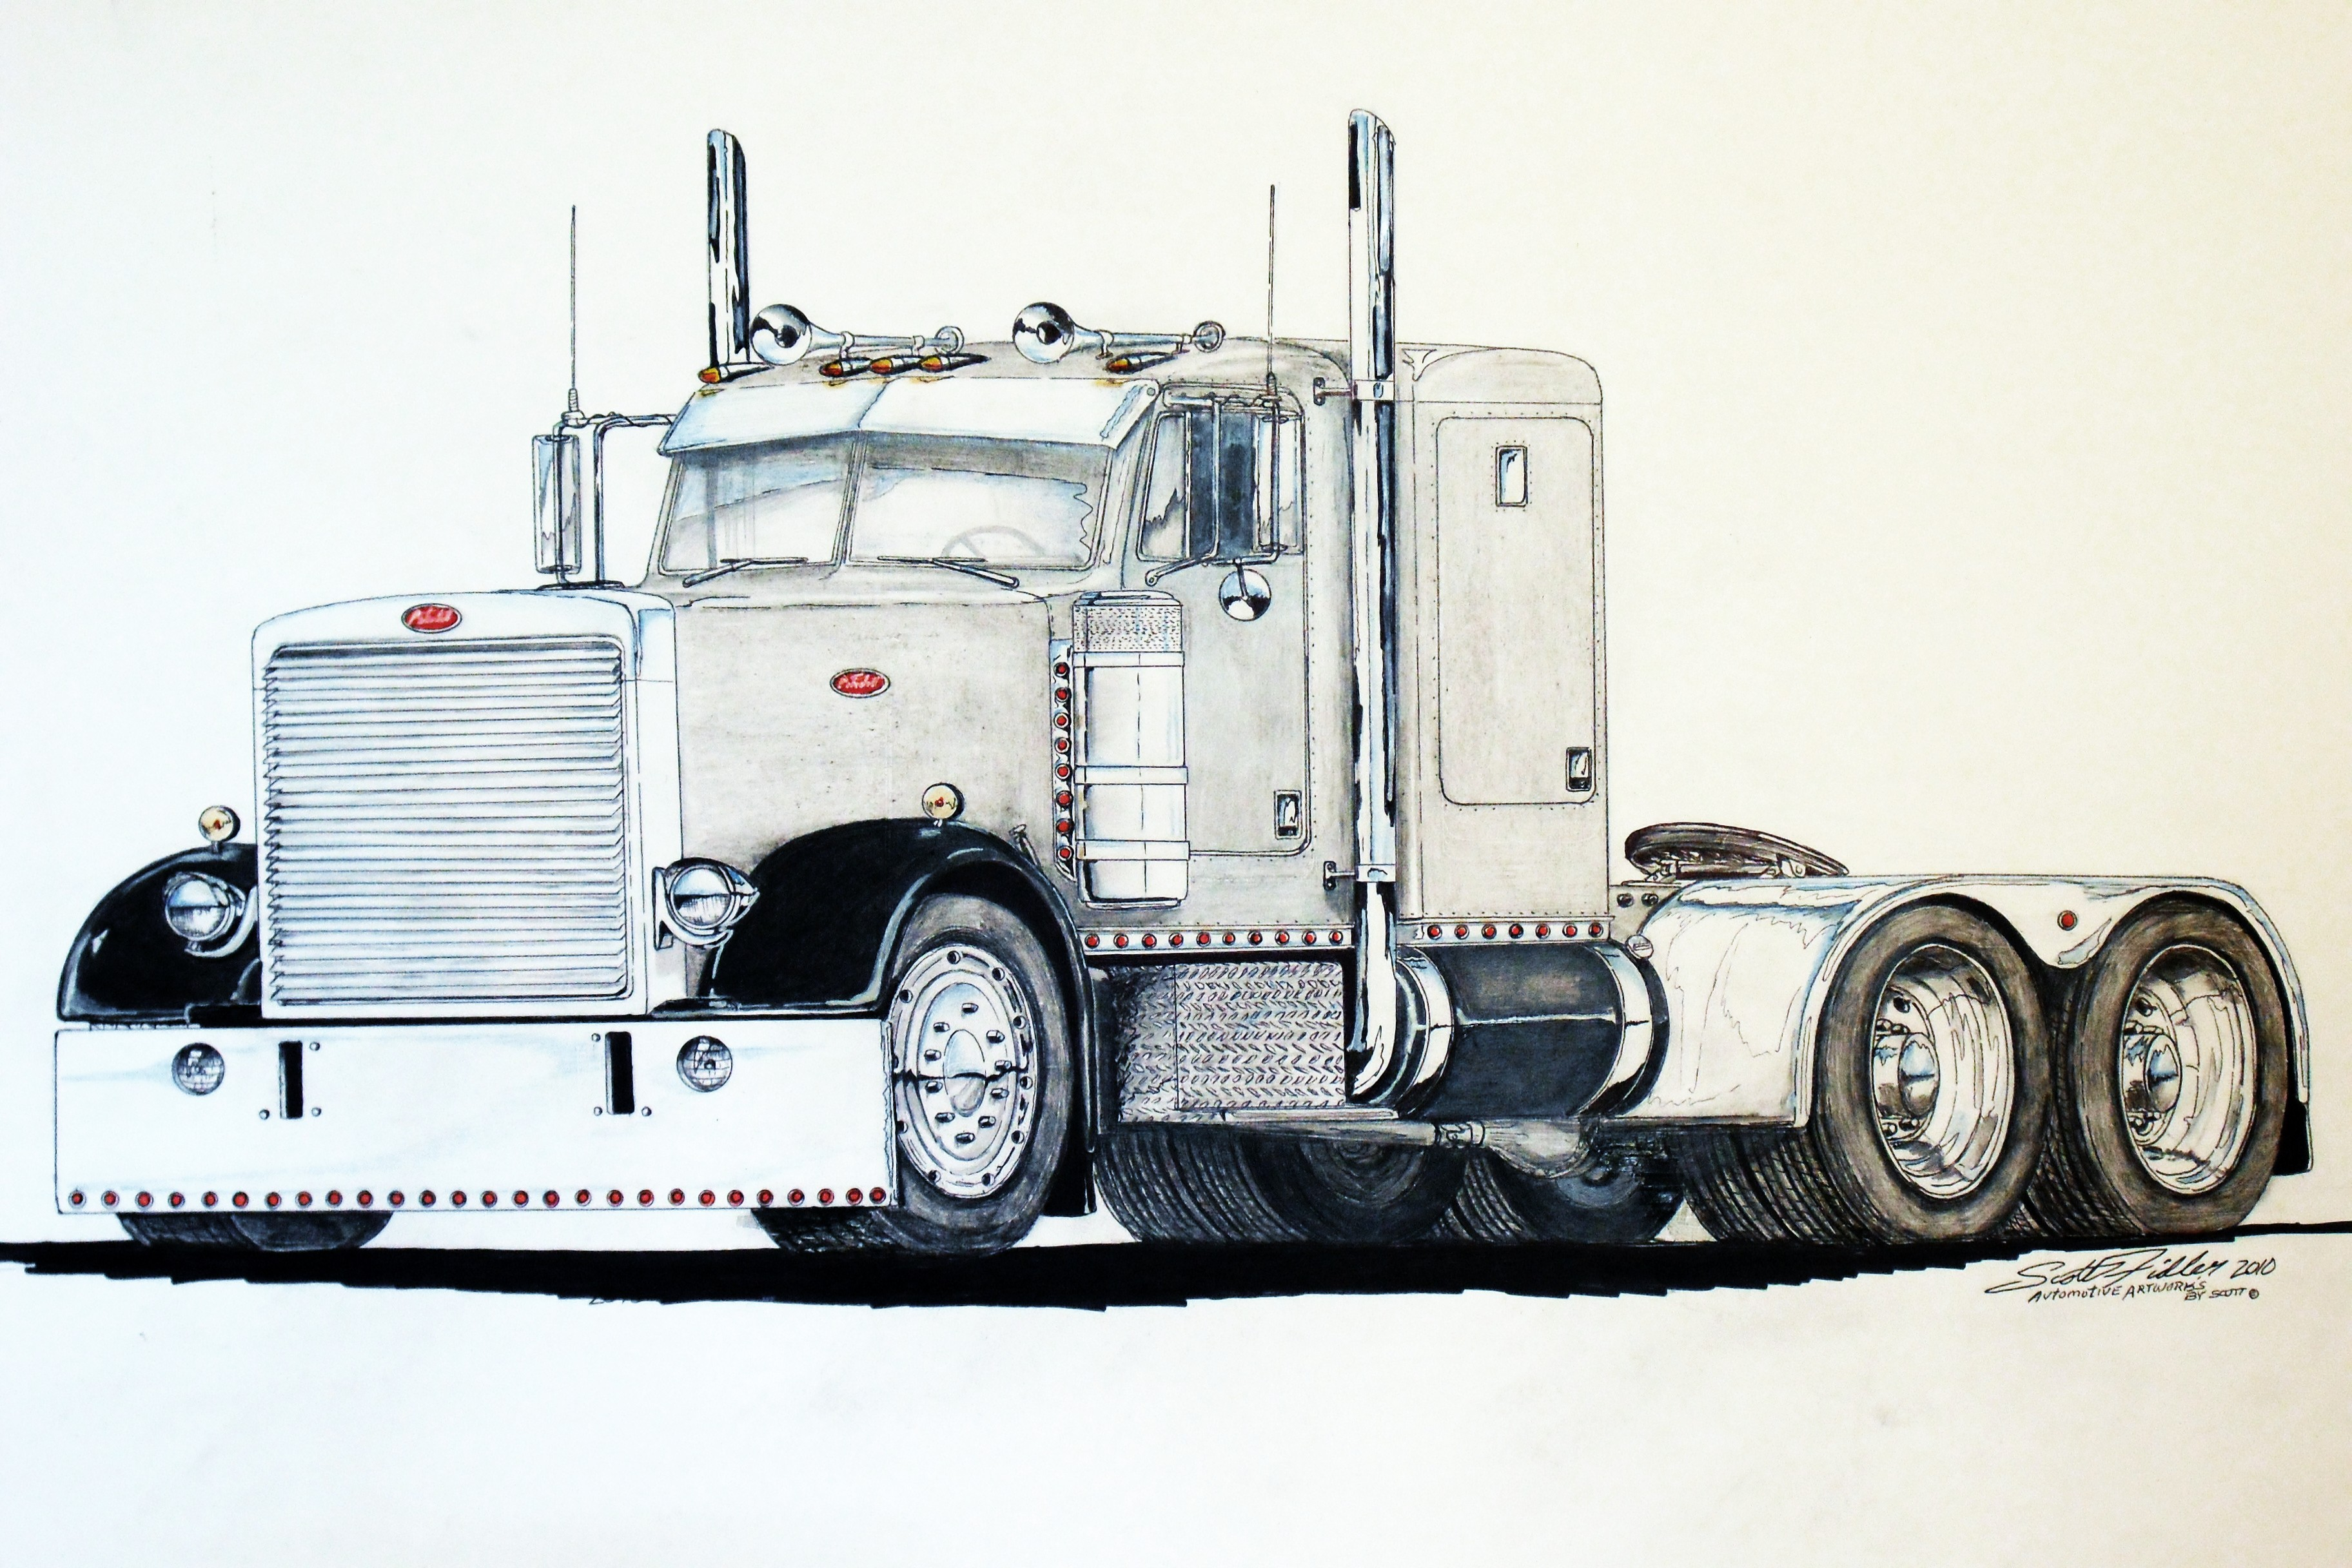 Peterbilt Semi Truck Drawings - Worksheet & Coloring Pages